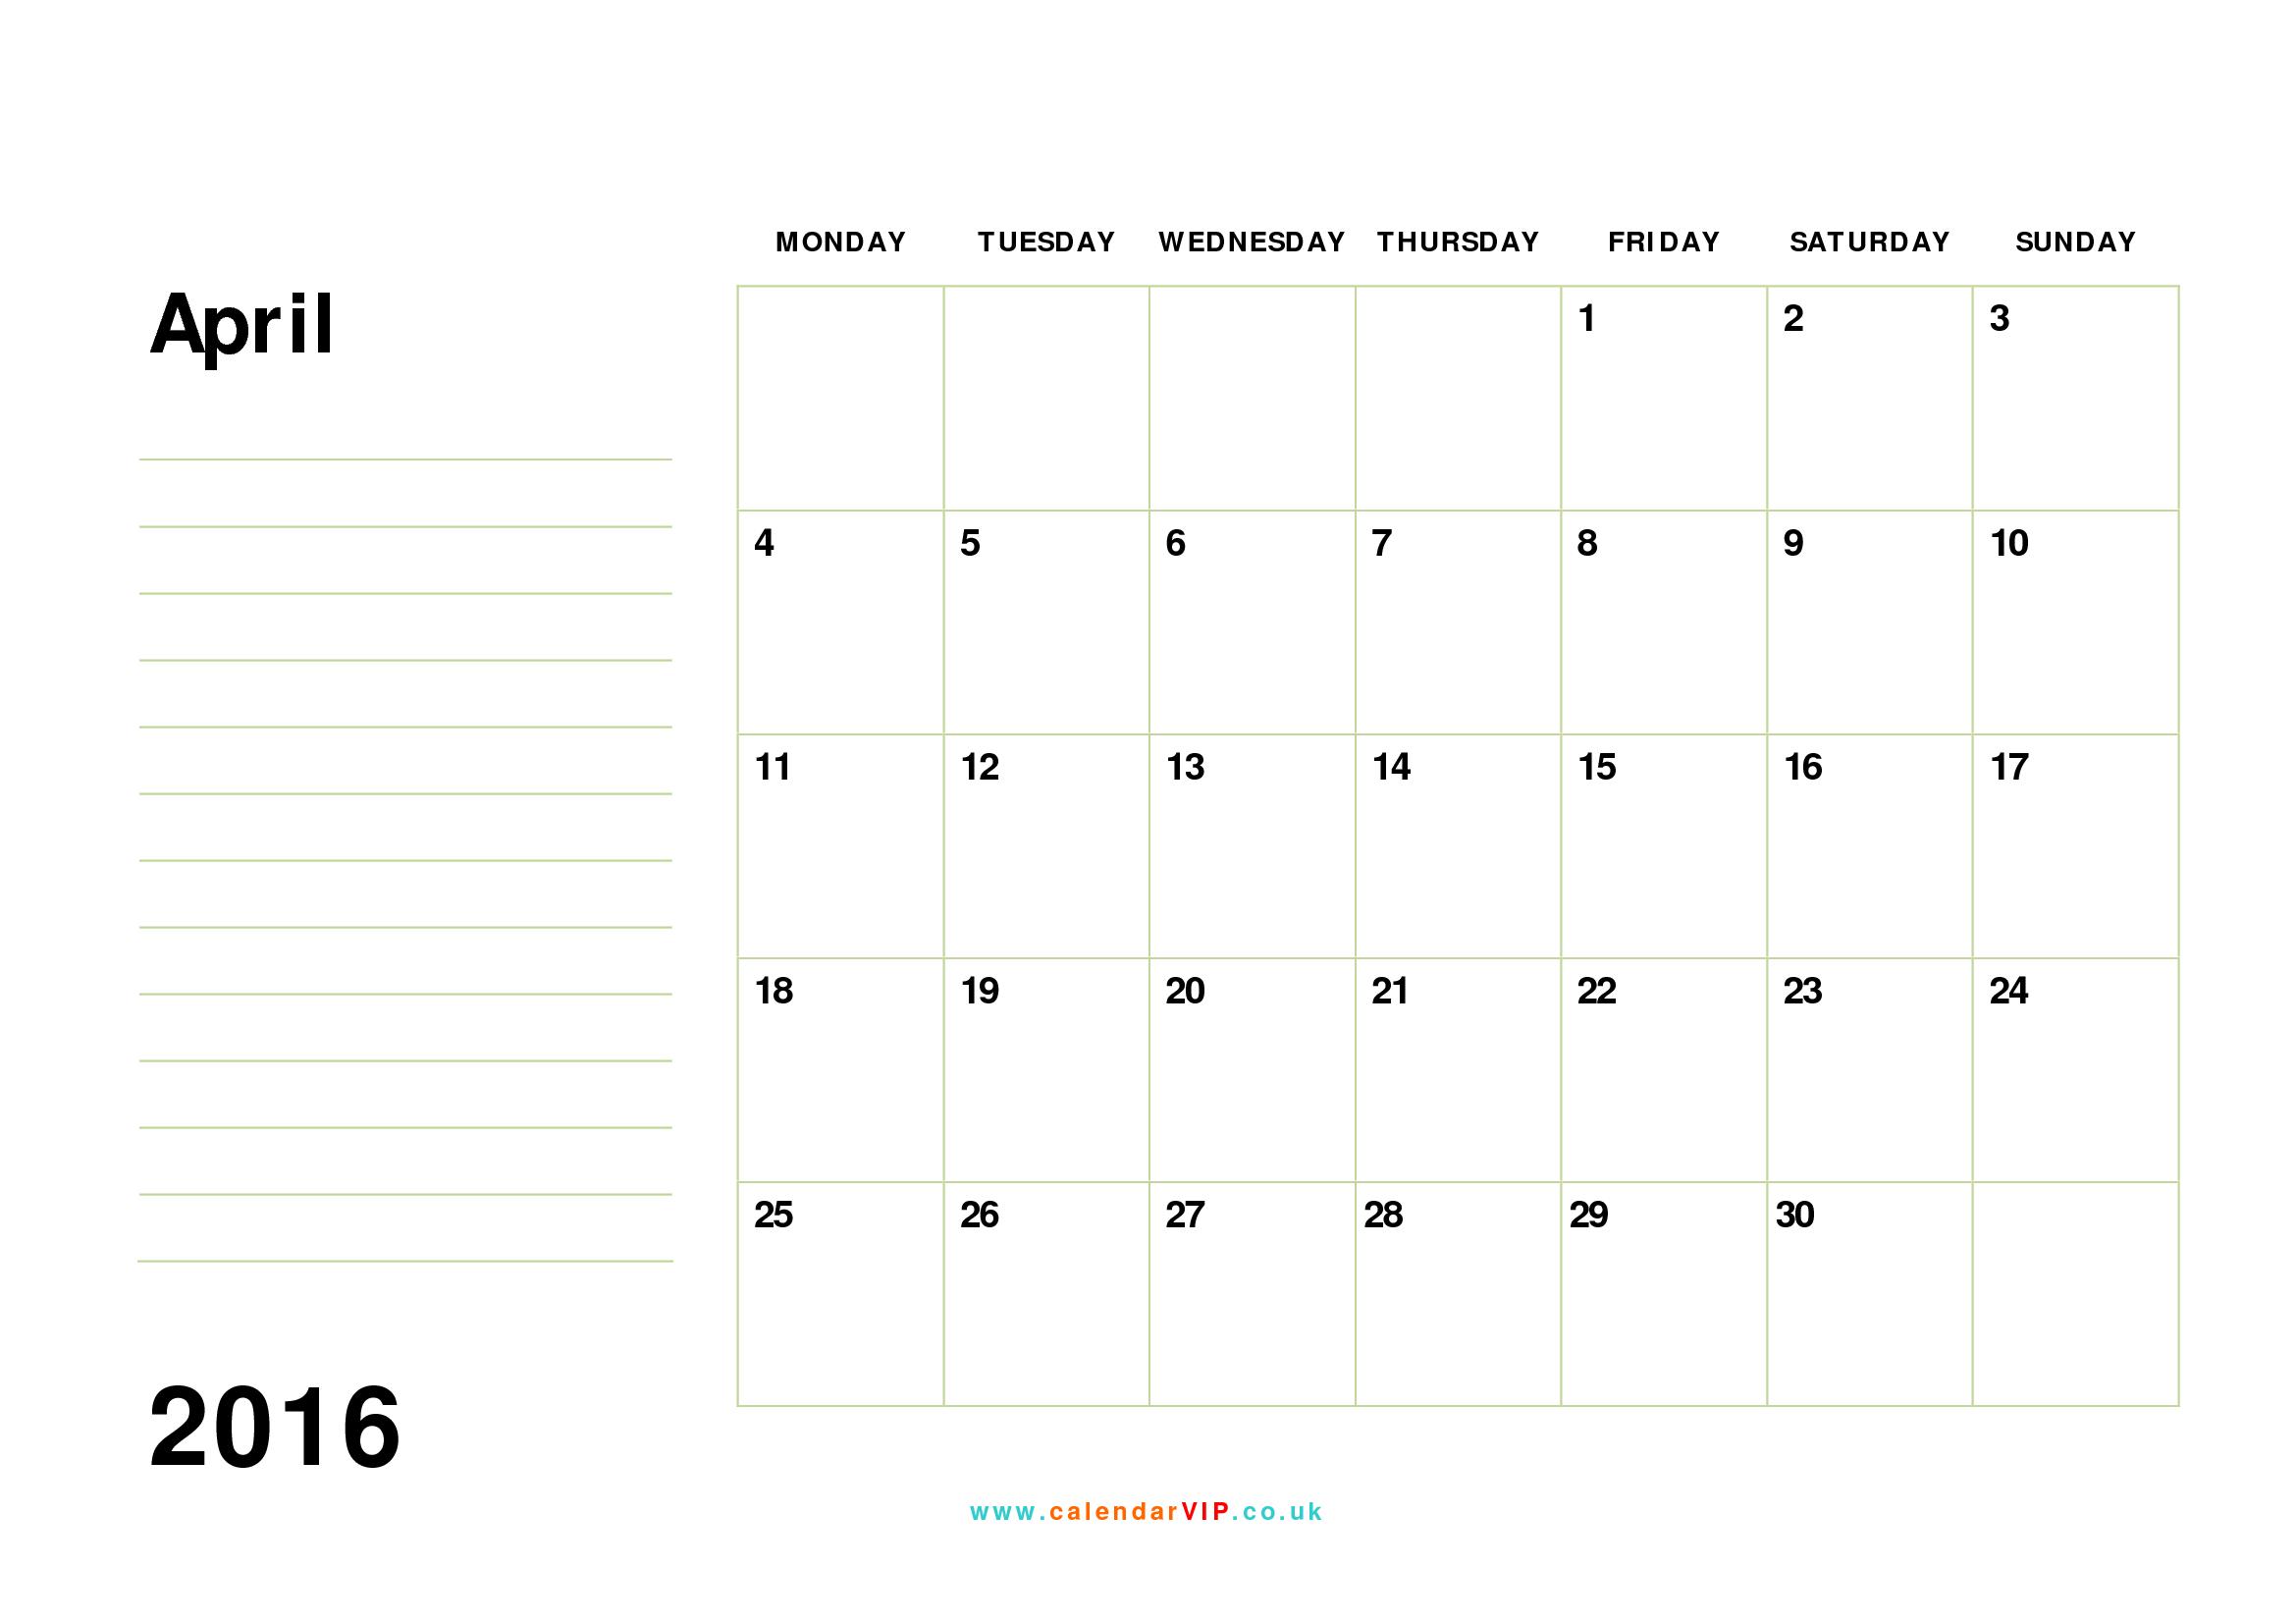 Weekly Calendar Doc : April calendar word doc template